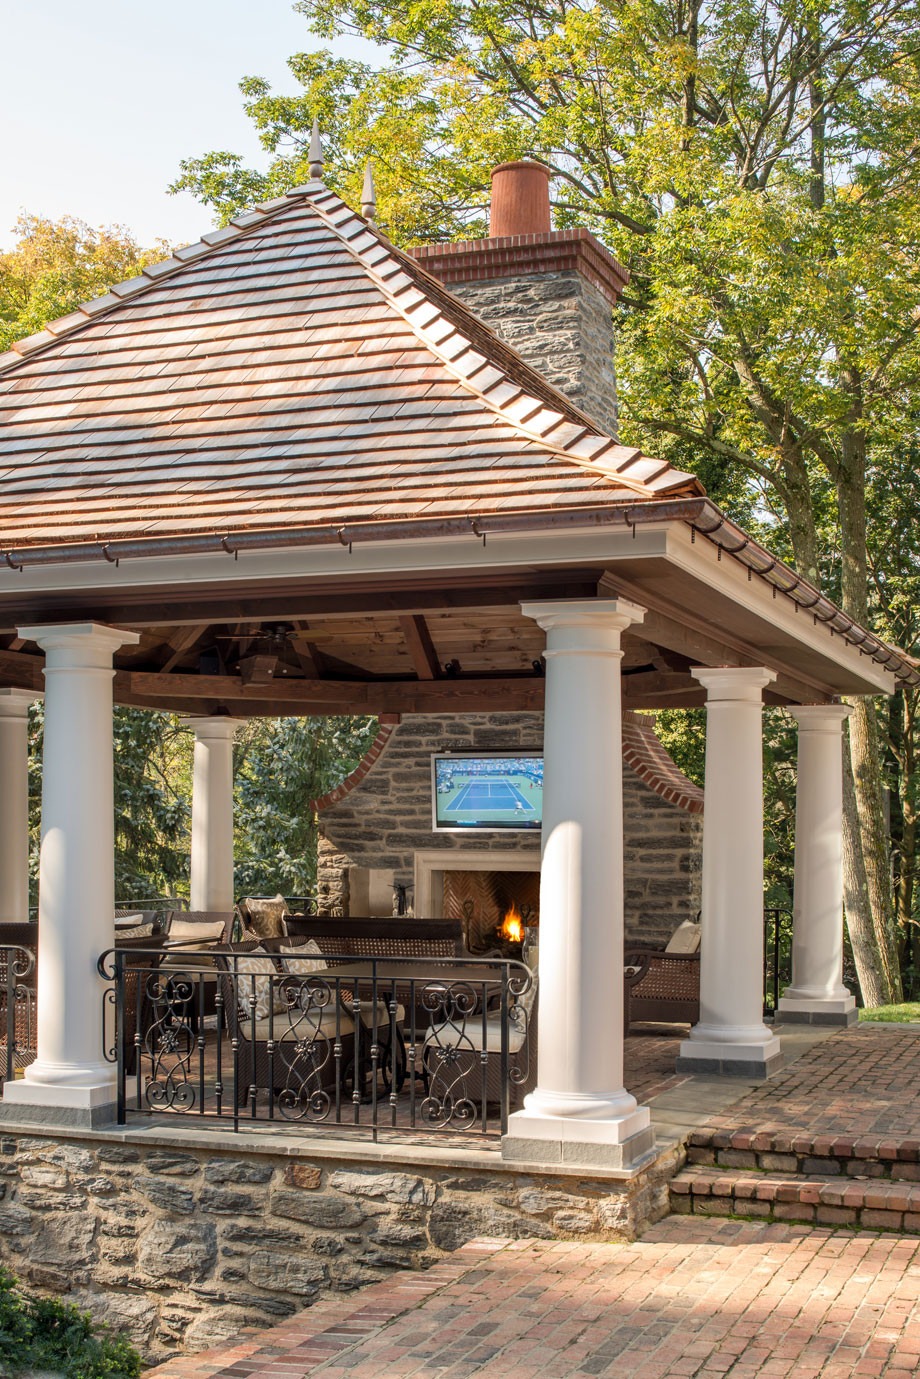 Gladwyne Pavilion